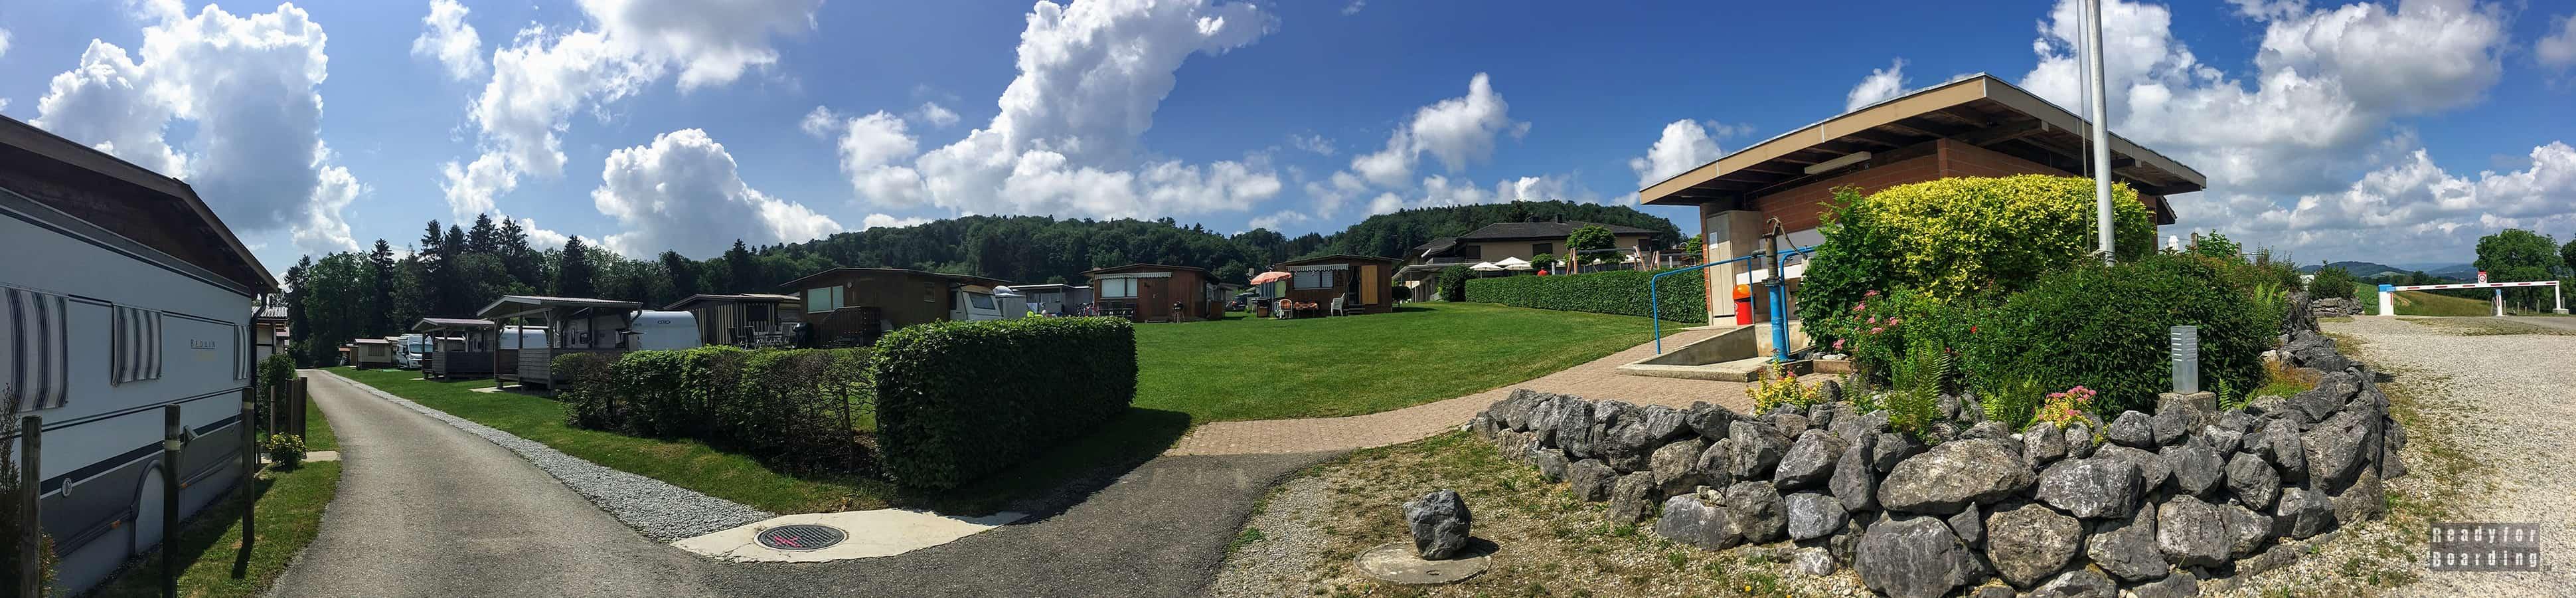 Panorama: Kempingi w Szwajcarii - Camping Huttenberg